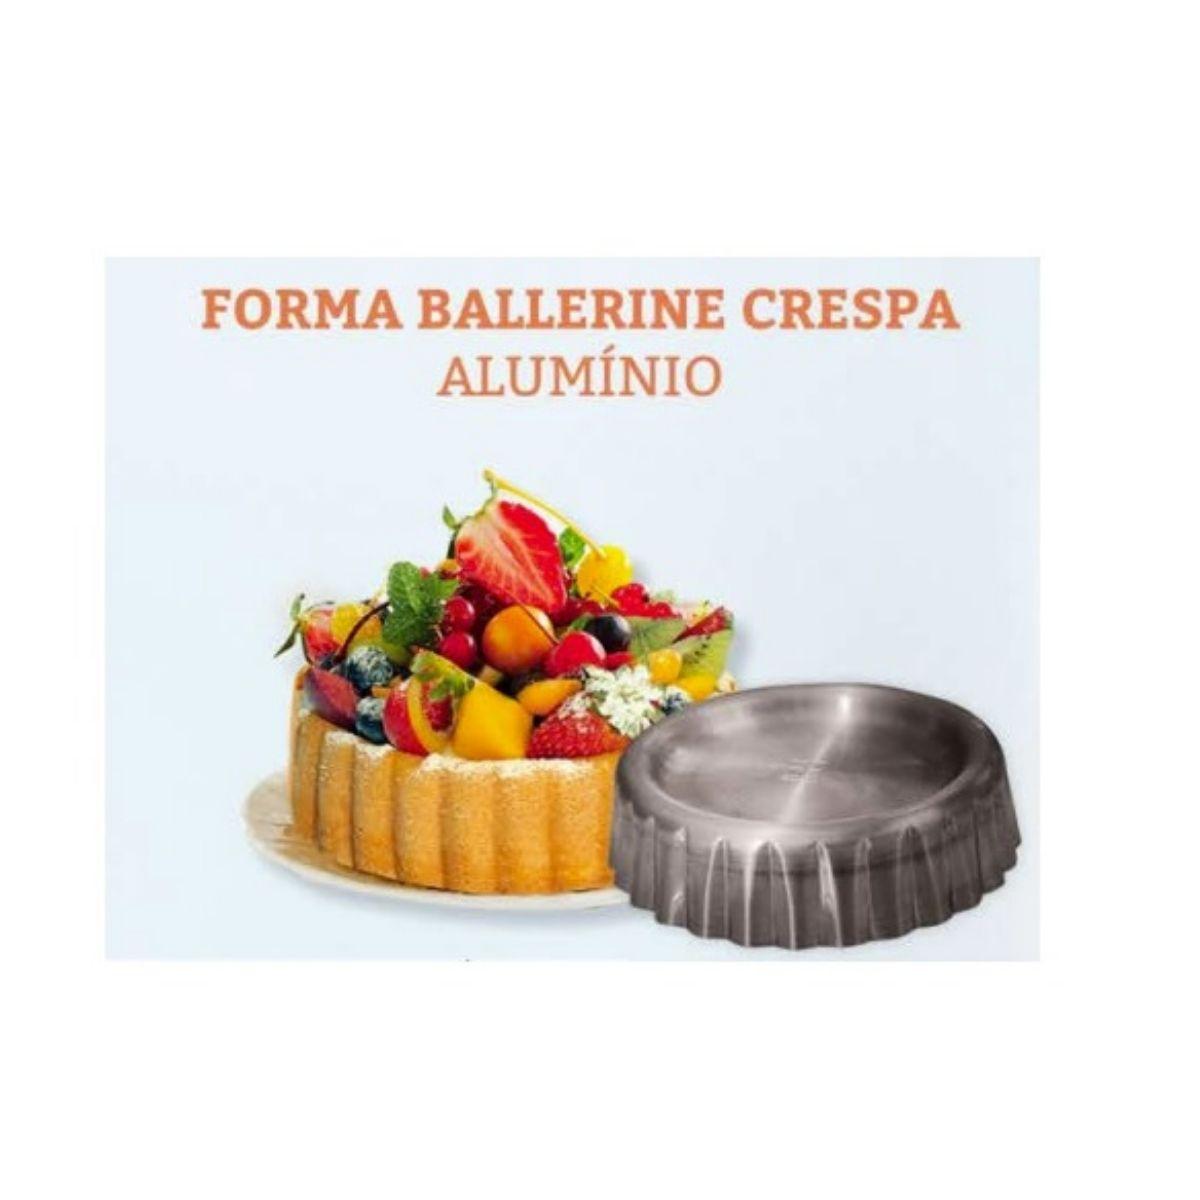 Forma Ballerine Crespa 18x4